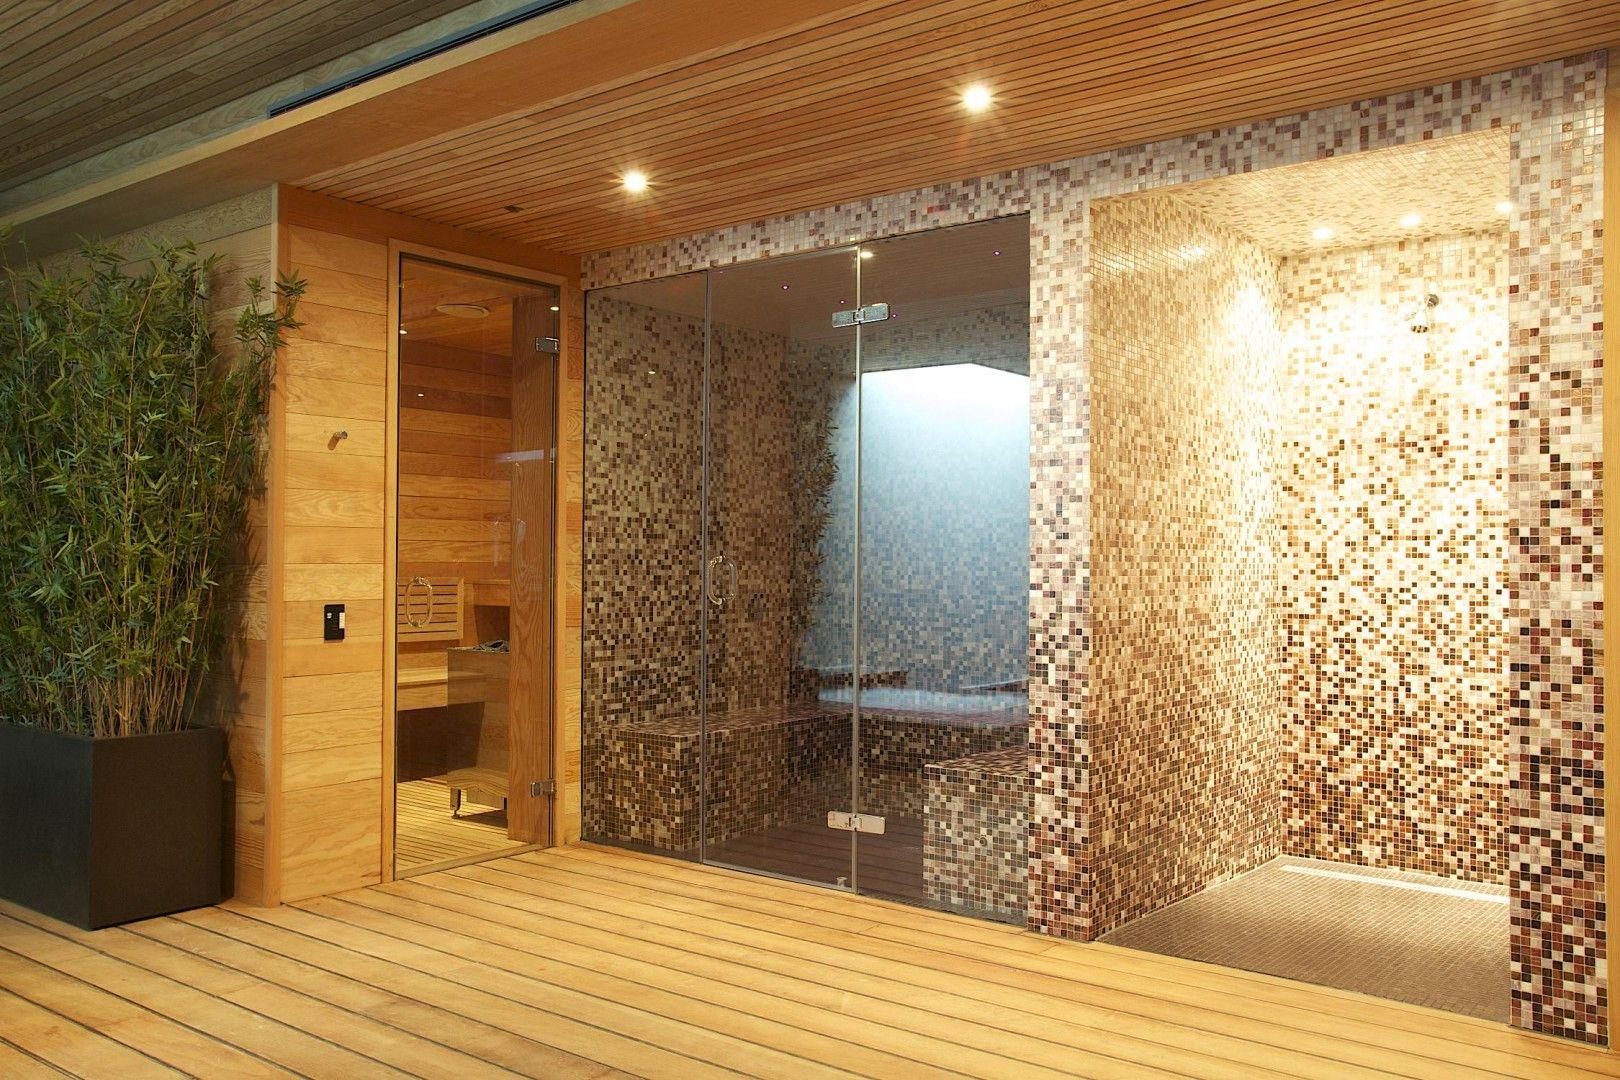 basement spa room sök på google badrums inspo on stunning backyard lighting design decor and remodel ideas sources to understand id=79528